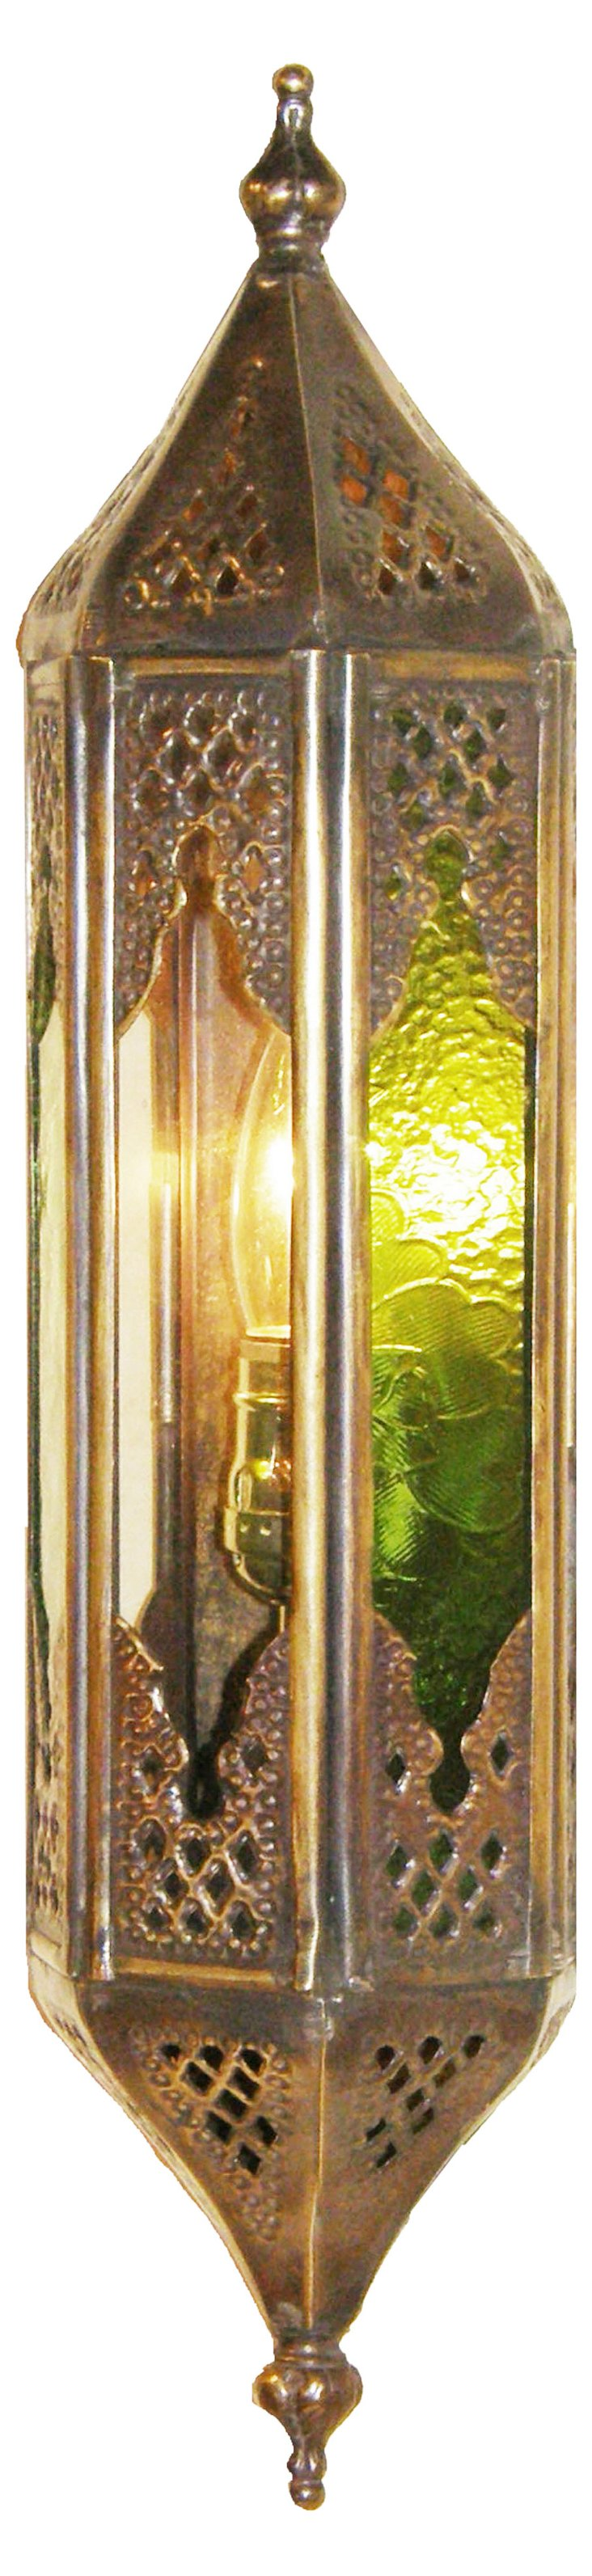 Nook 1-Light Lantern, Antiqued Brass